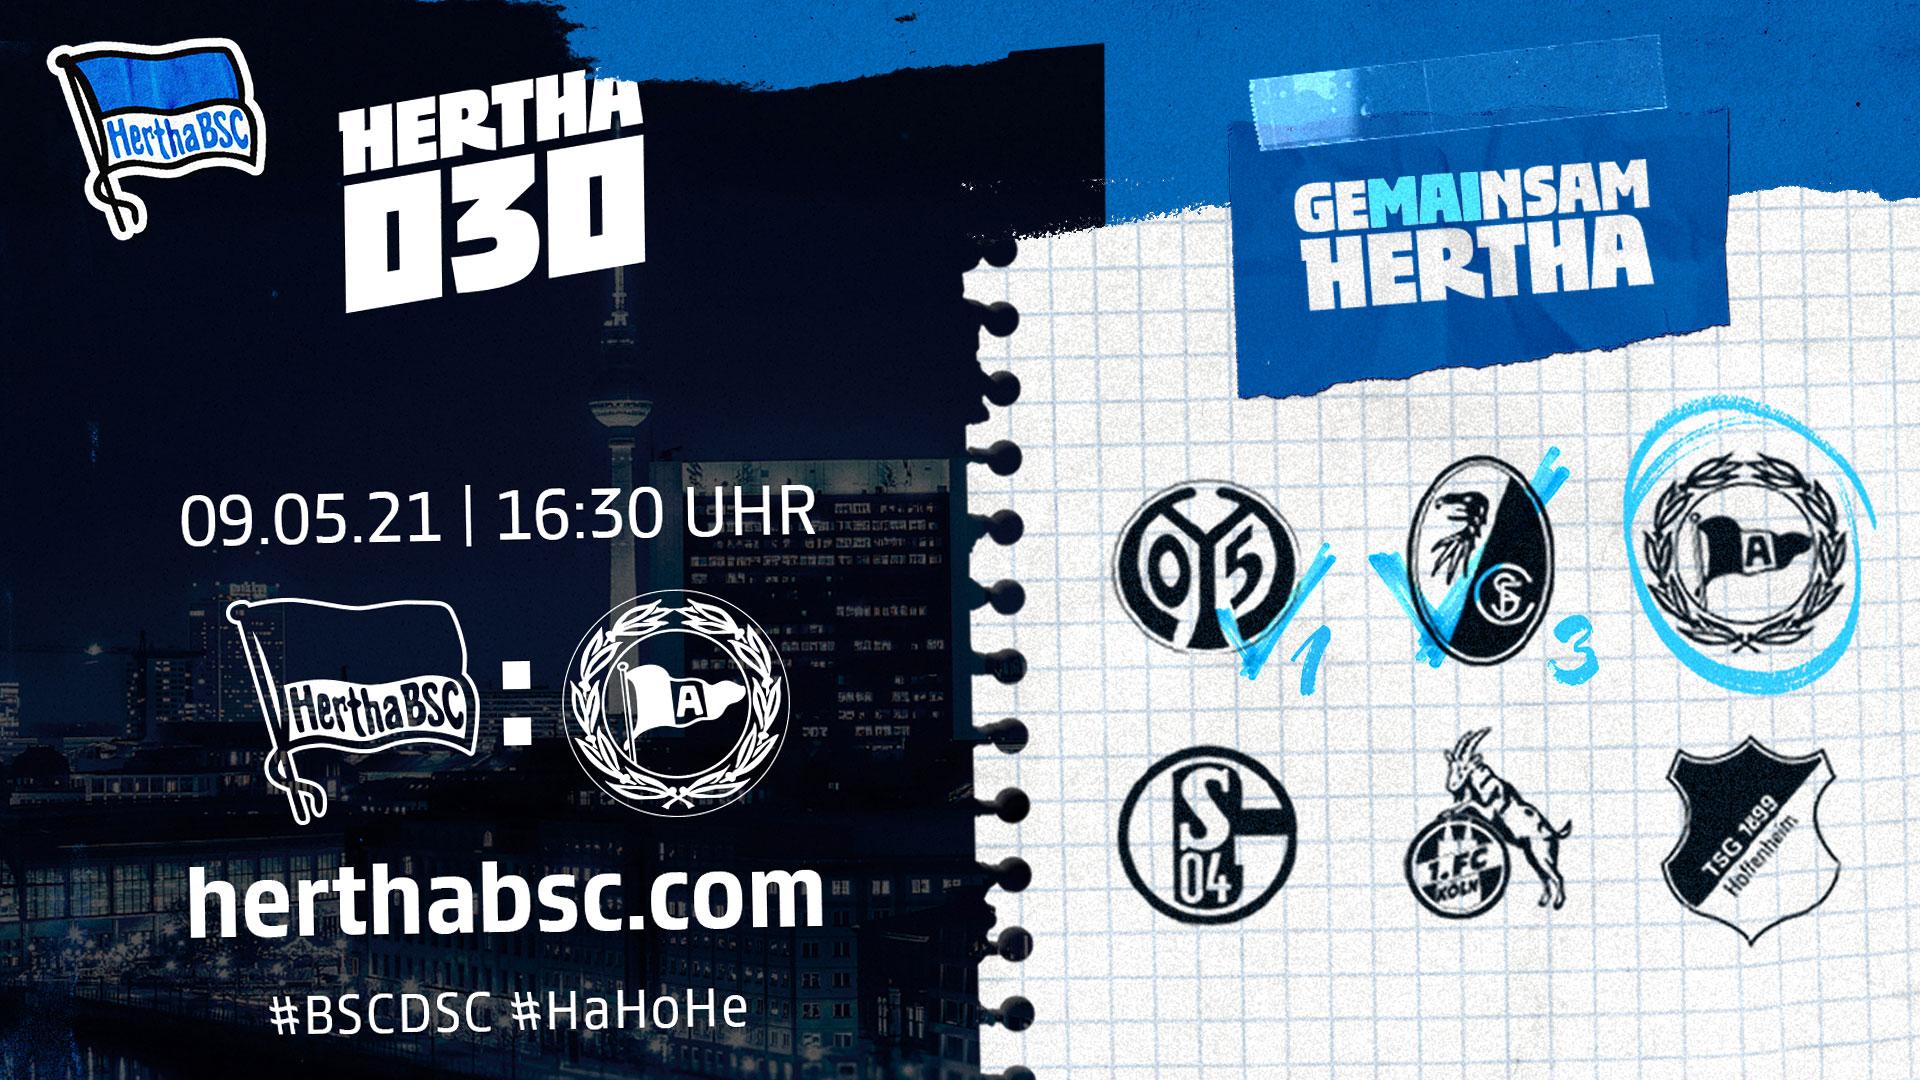 Hertha030 gegen Bielefeld